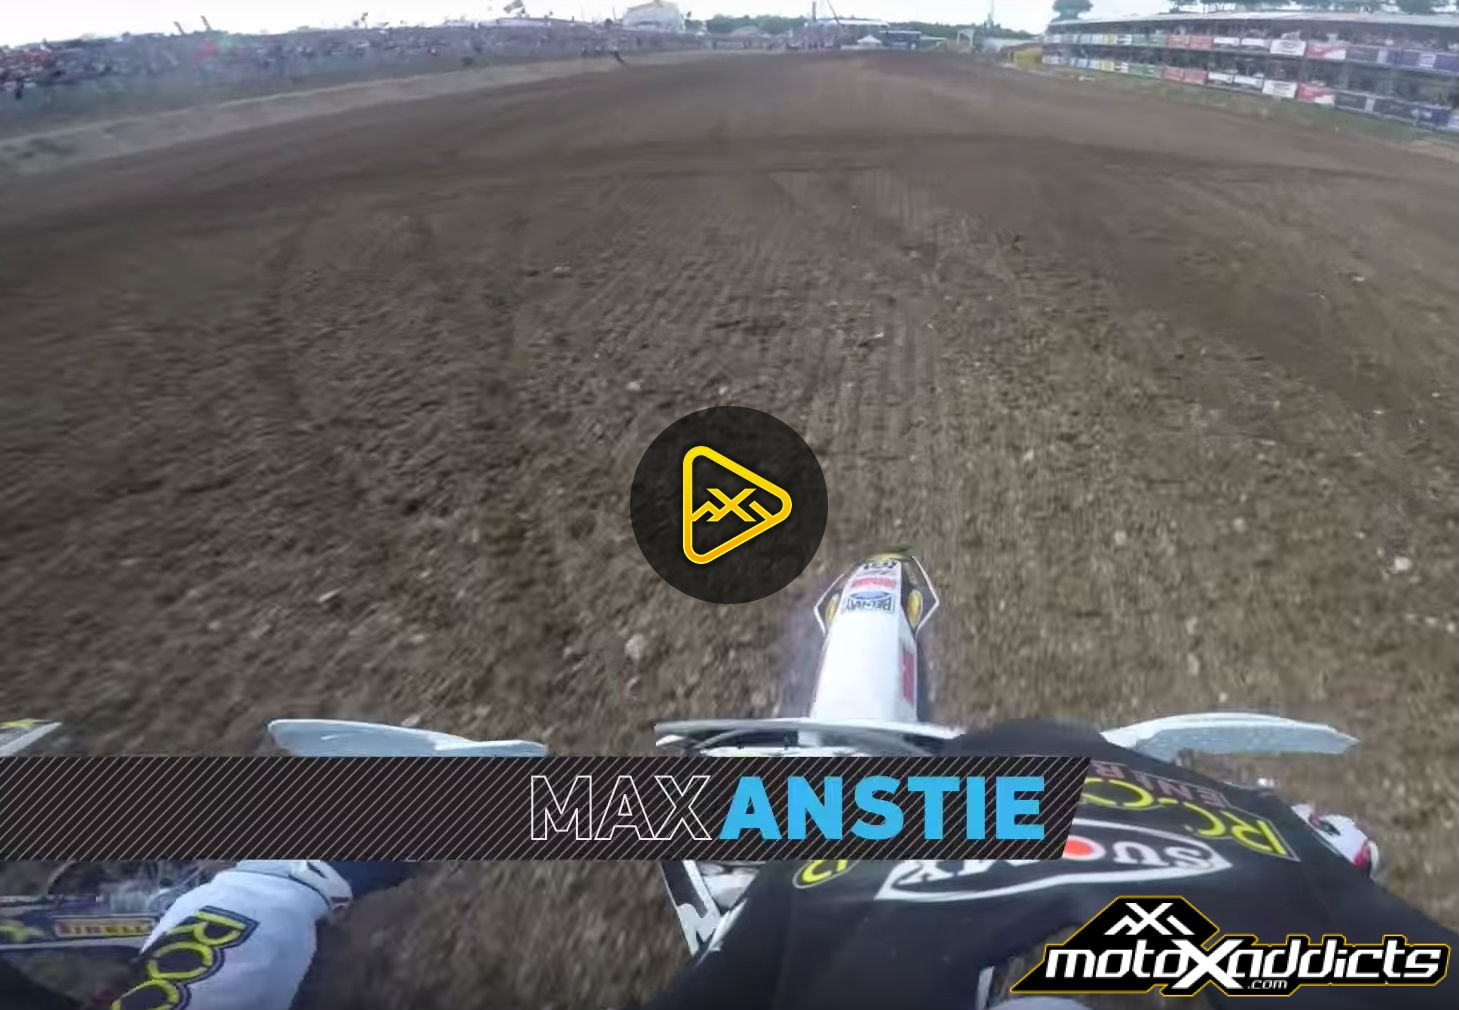 GoPro Helmet Cam: Max Anstie at 2016 MXGP of France